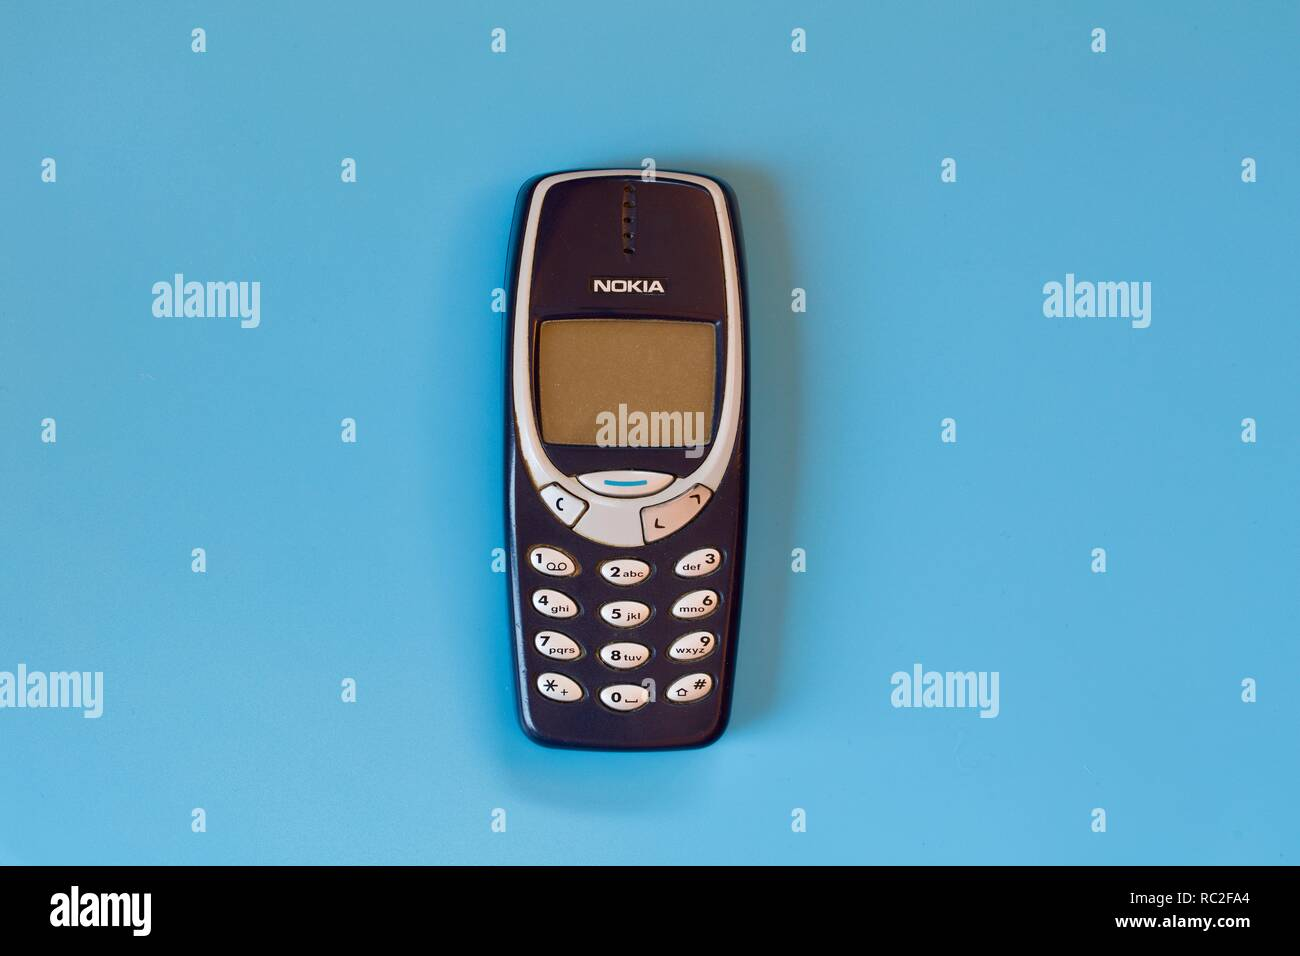 Nokia 3000 series  mobile phone - Stock Image